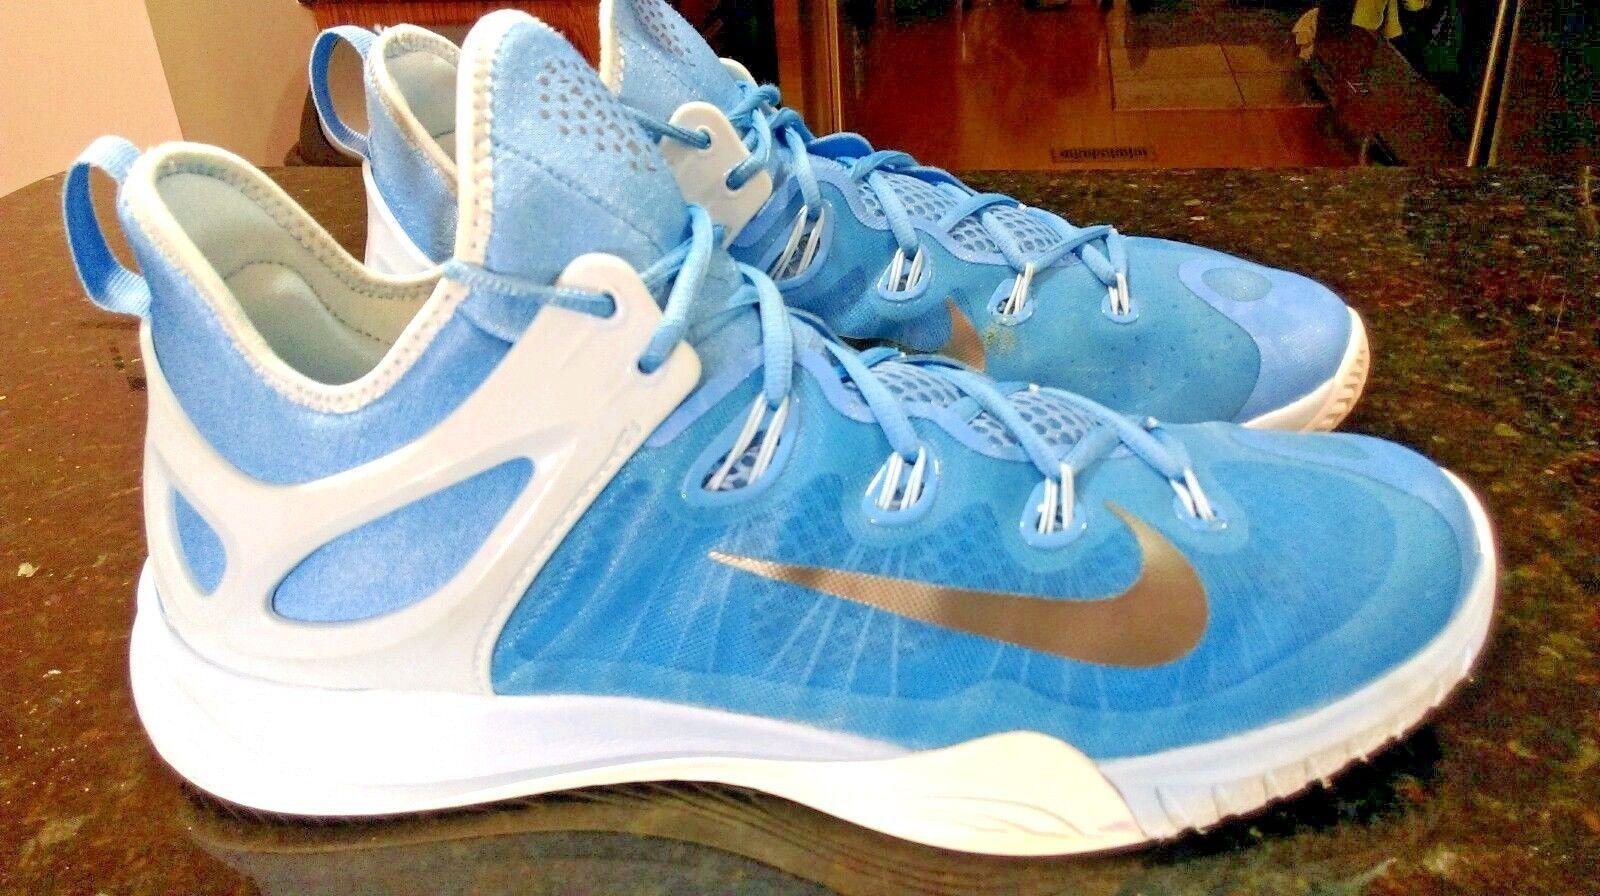 Mens NIKE ZOOM HYPERREV 2015 Basketball shoes 742247 403 Powder blueE WHITE Sz 14